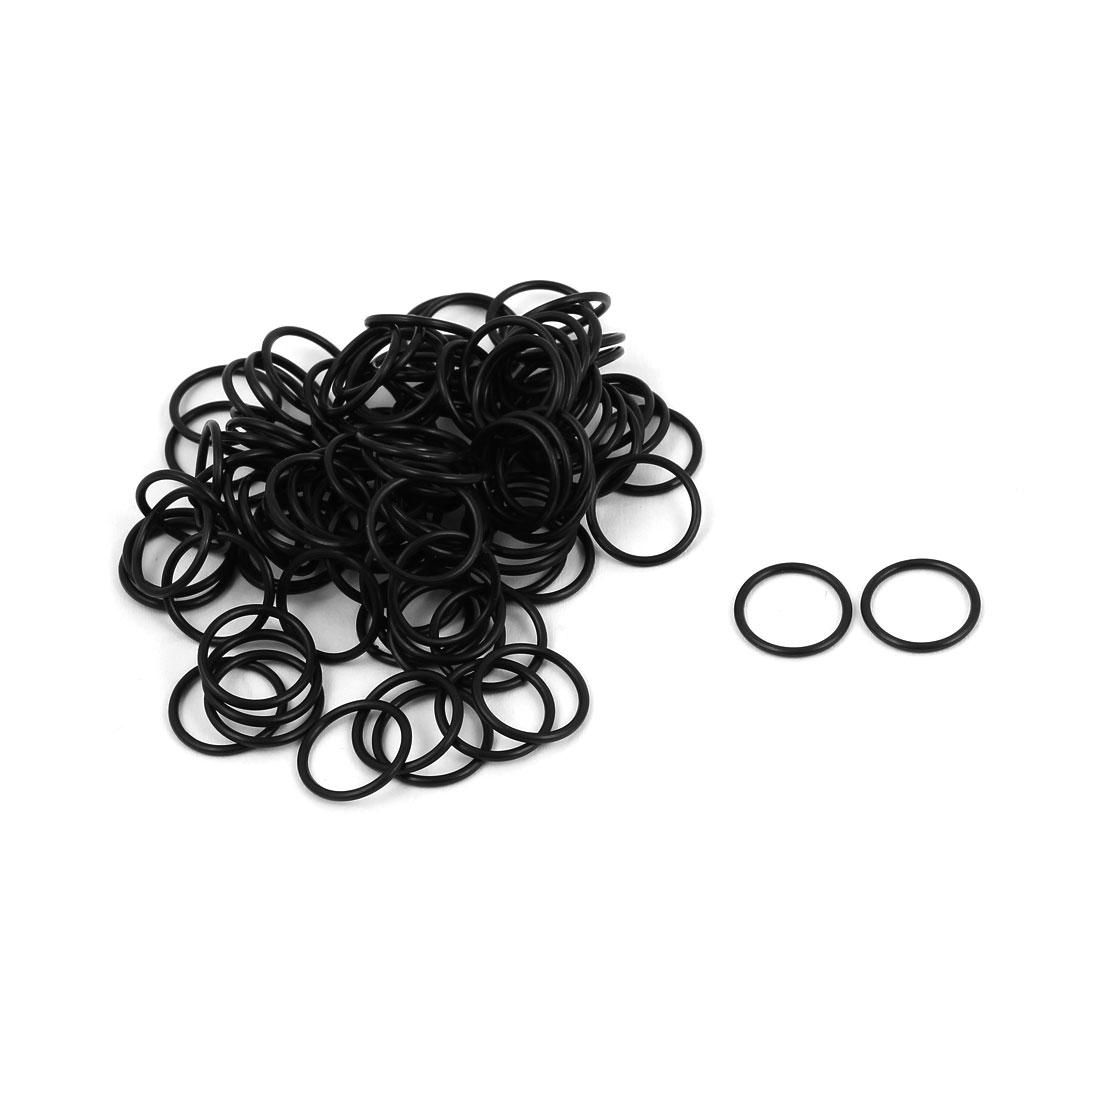 100Pcs Black 7.9mm x 0.8mm Nitrile Rubber O Ring NBR Oil Sealing Grommets